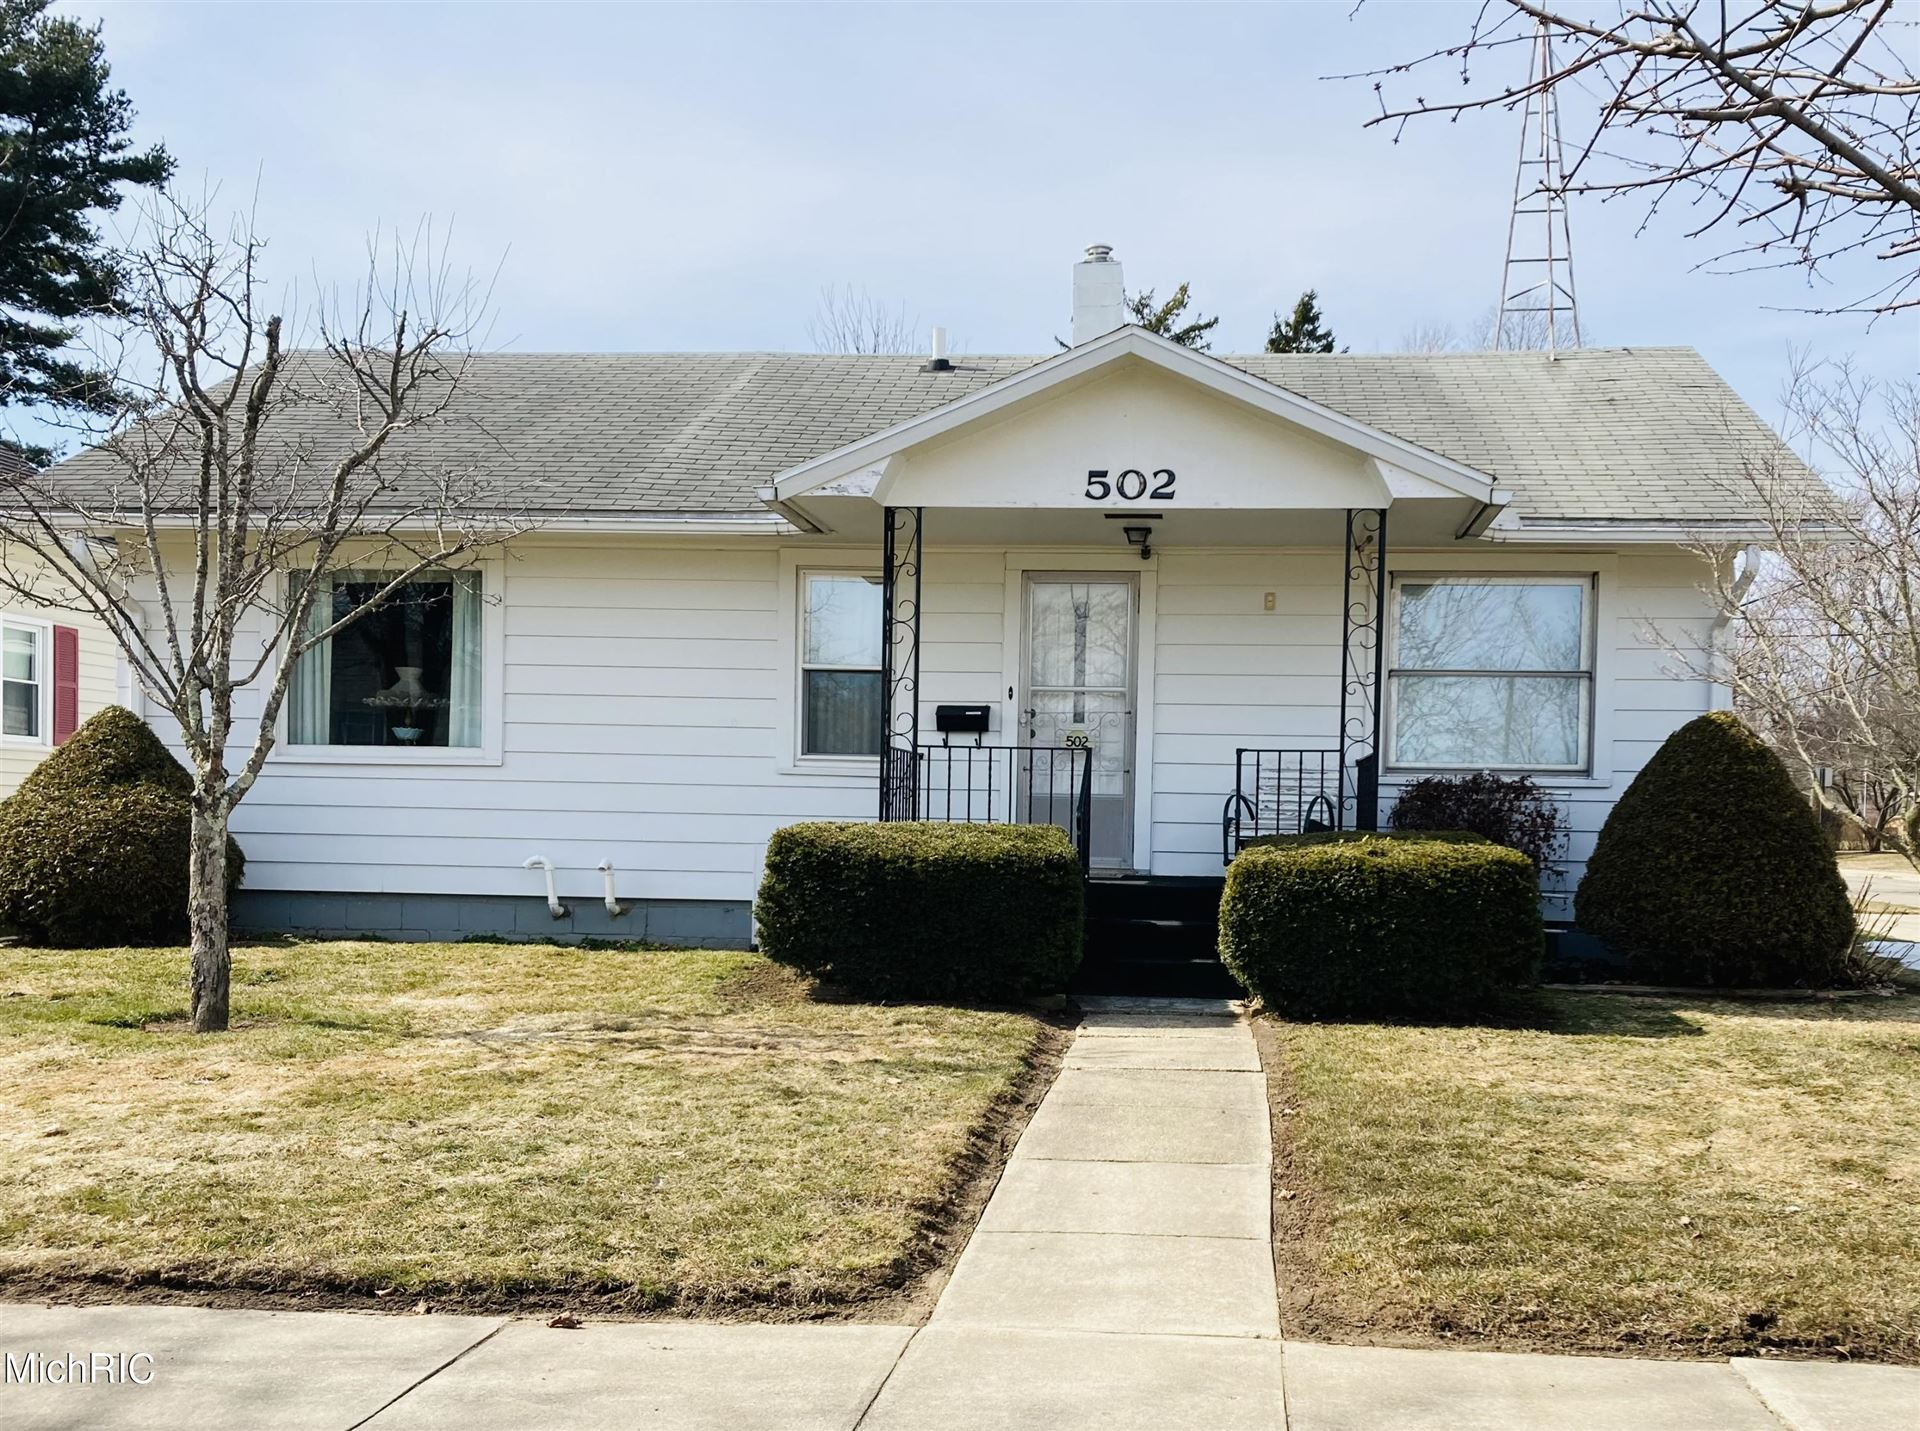 502 Sylvan Street, Buchanan, MI 49107 - MLS#: 21007139